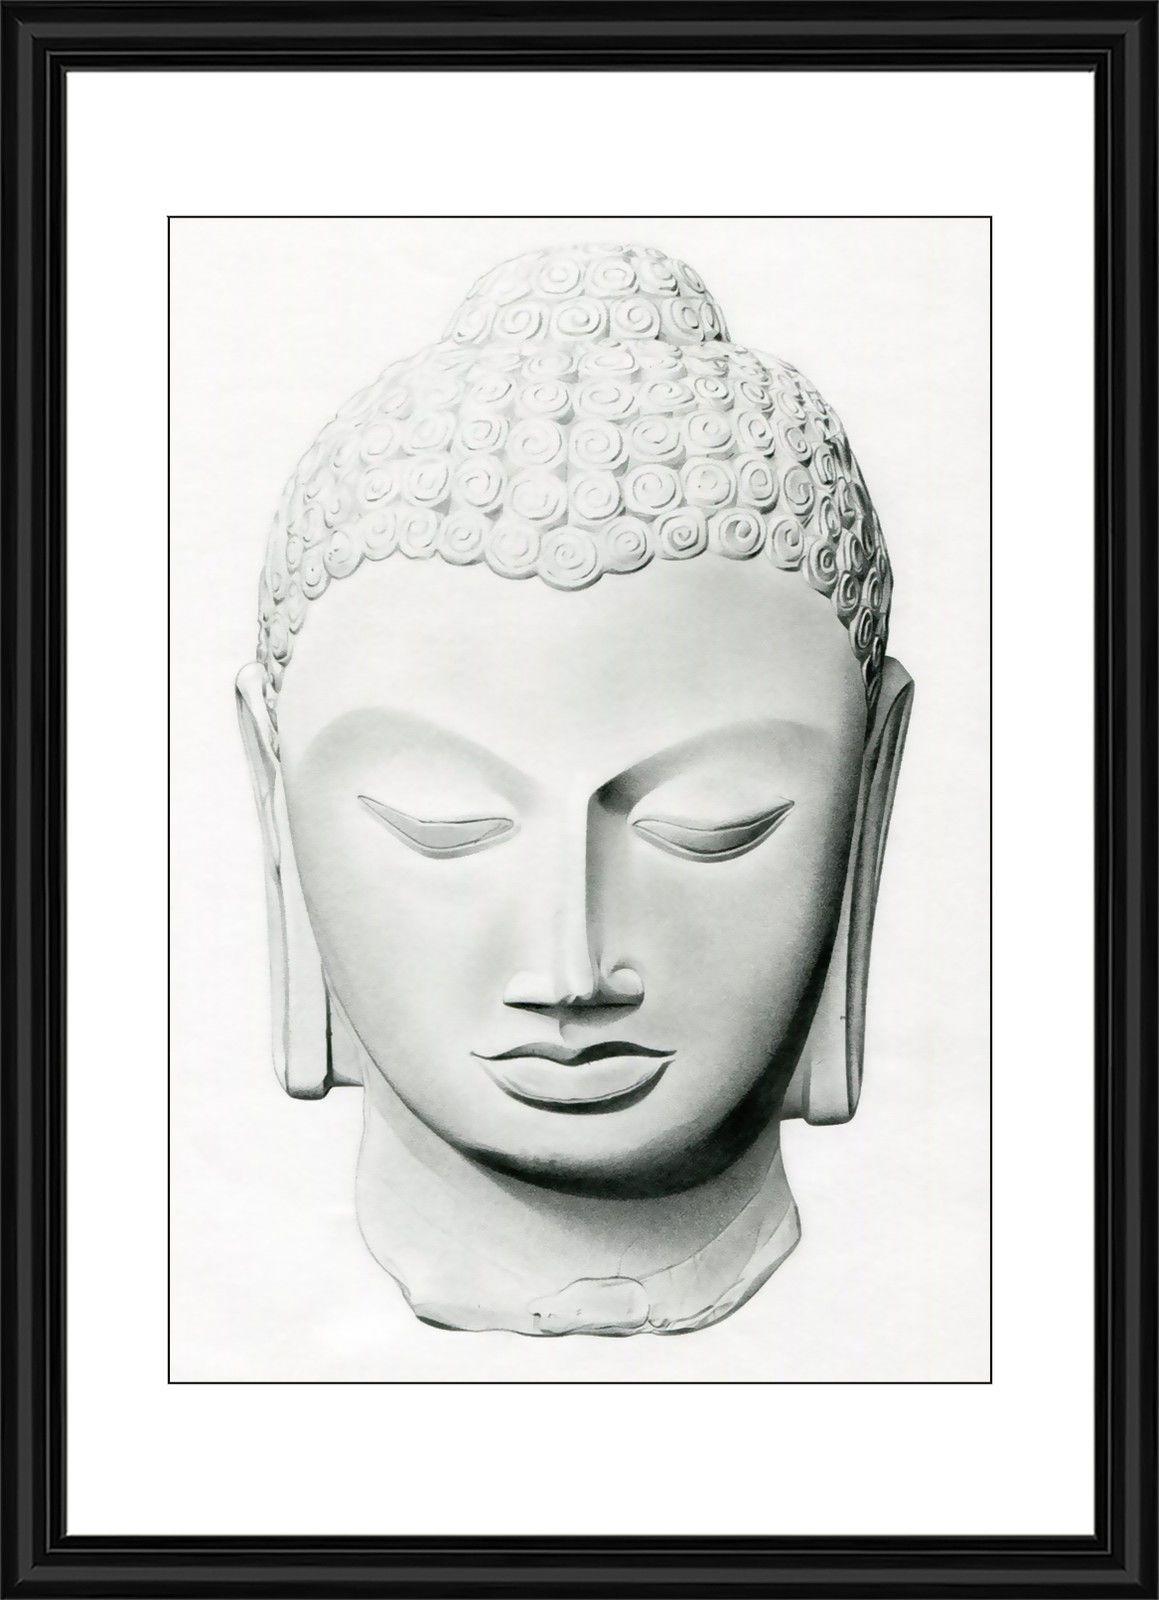 Buddha buddhist white stone statue framed art #print #picture, View ...